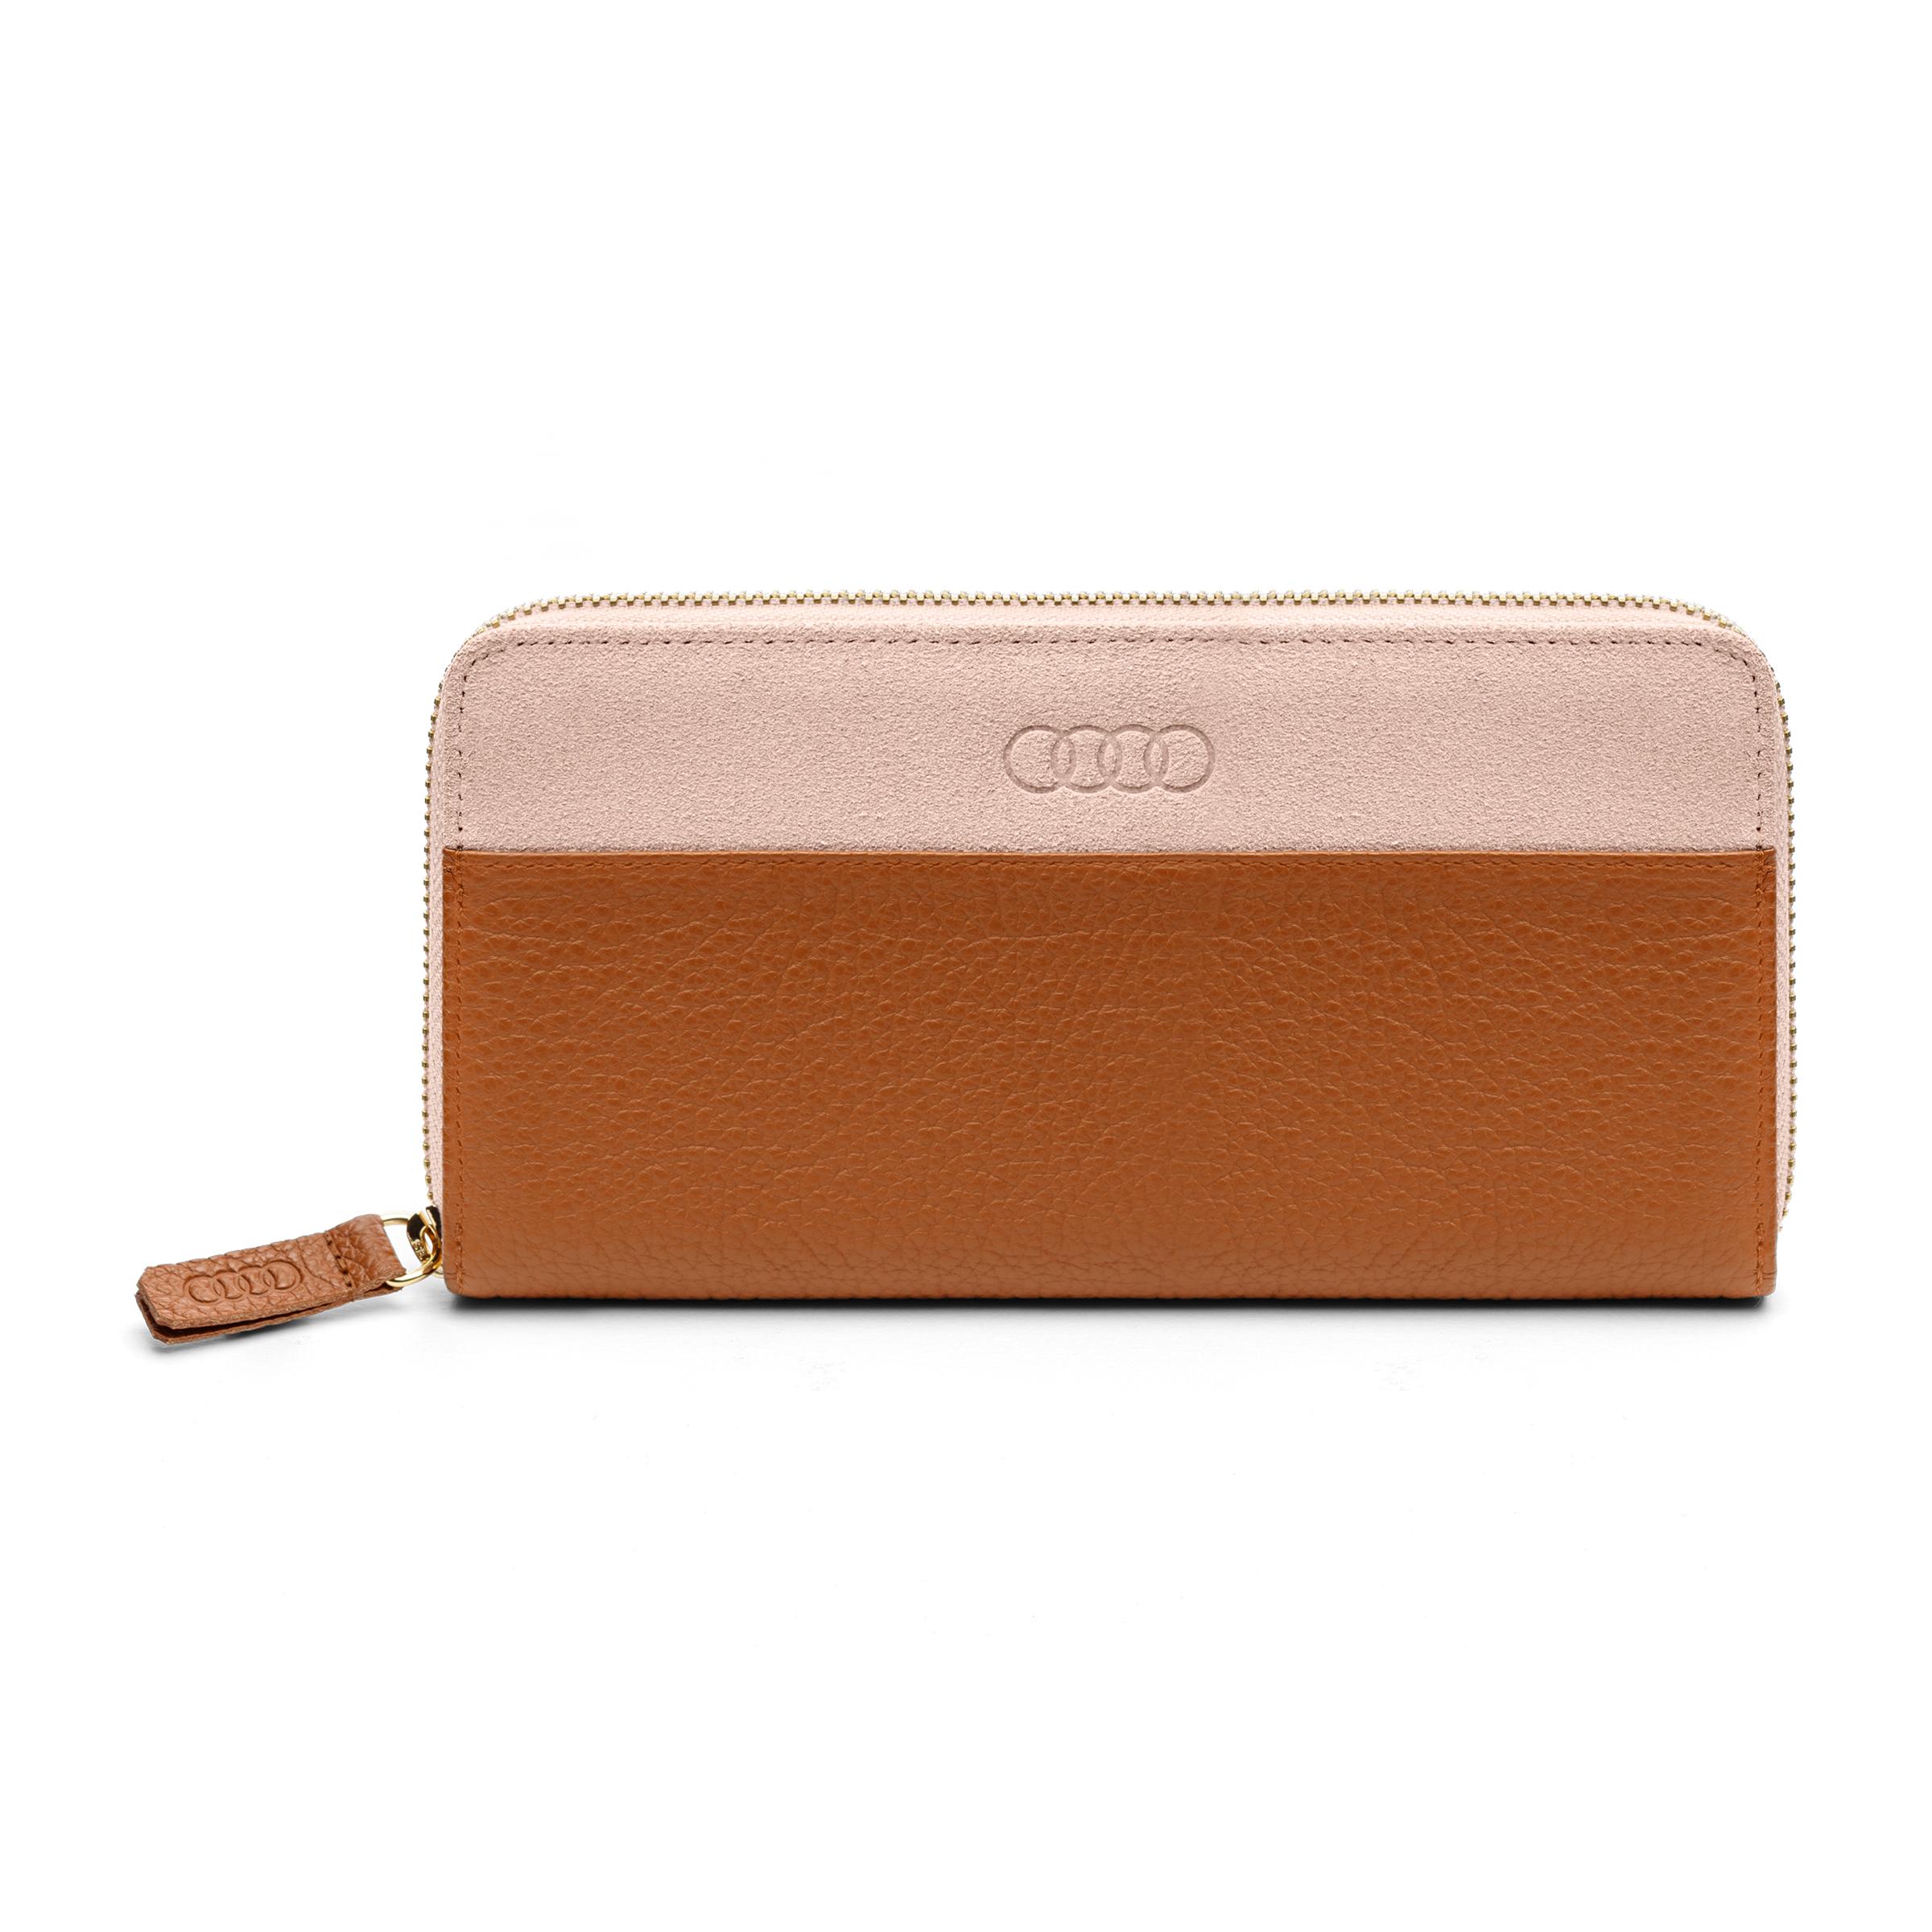 Audi Geldbörse Leder für Damen braun-rosé